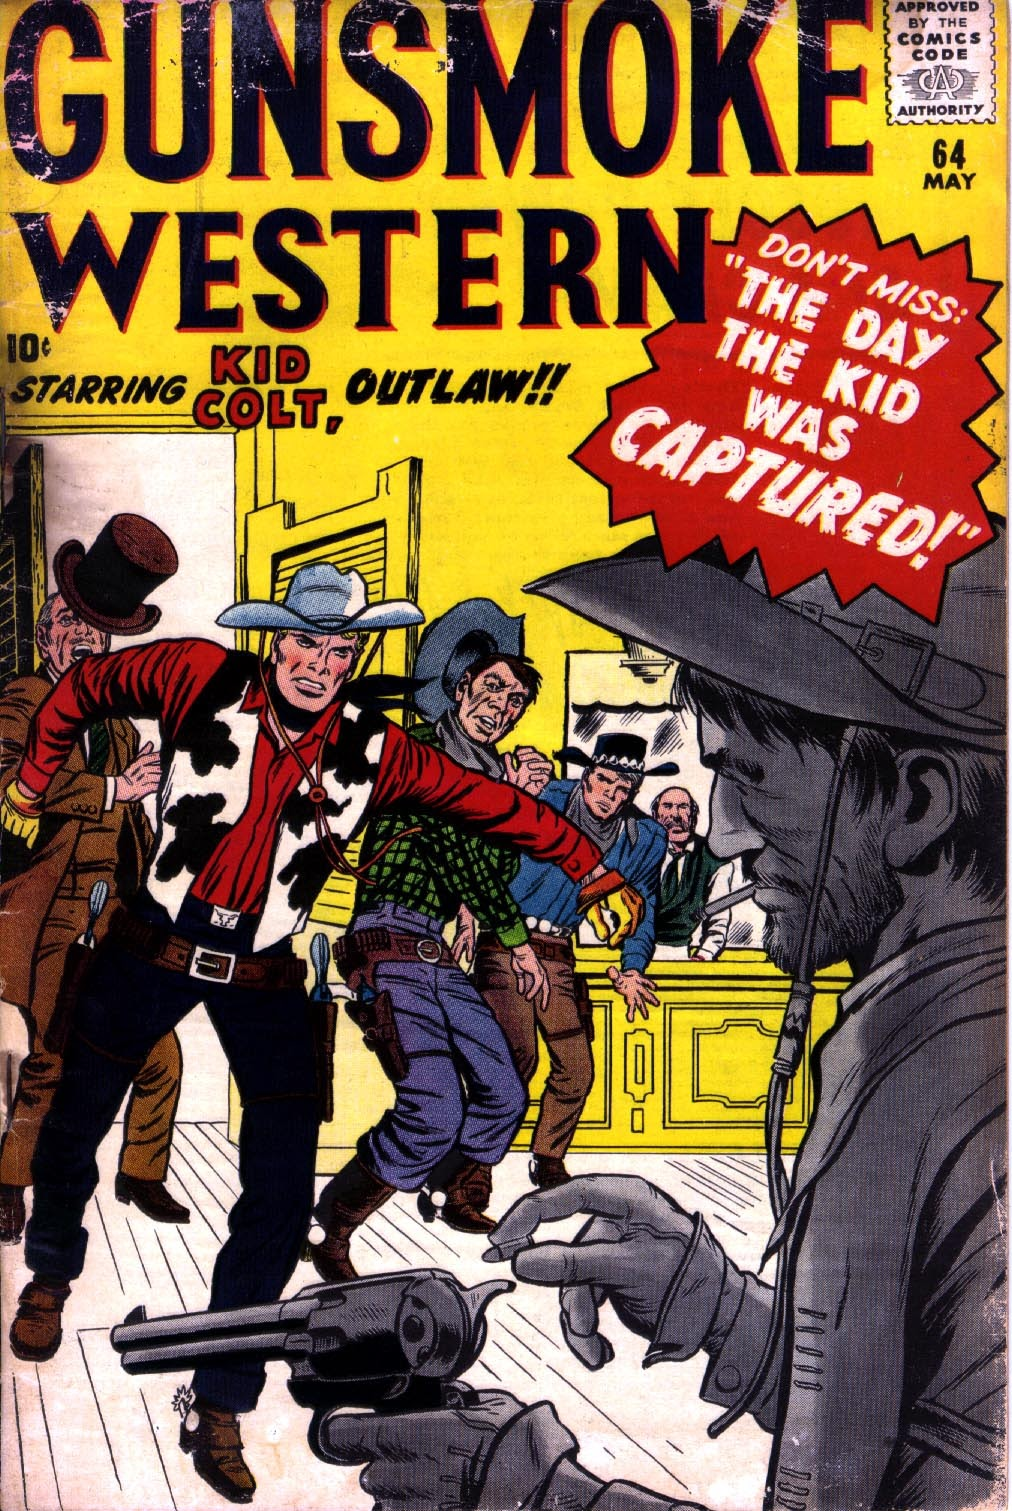 Gunsmoke Western issue 64 - Page 1